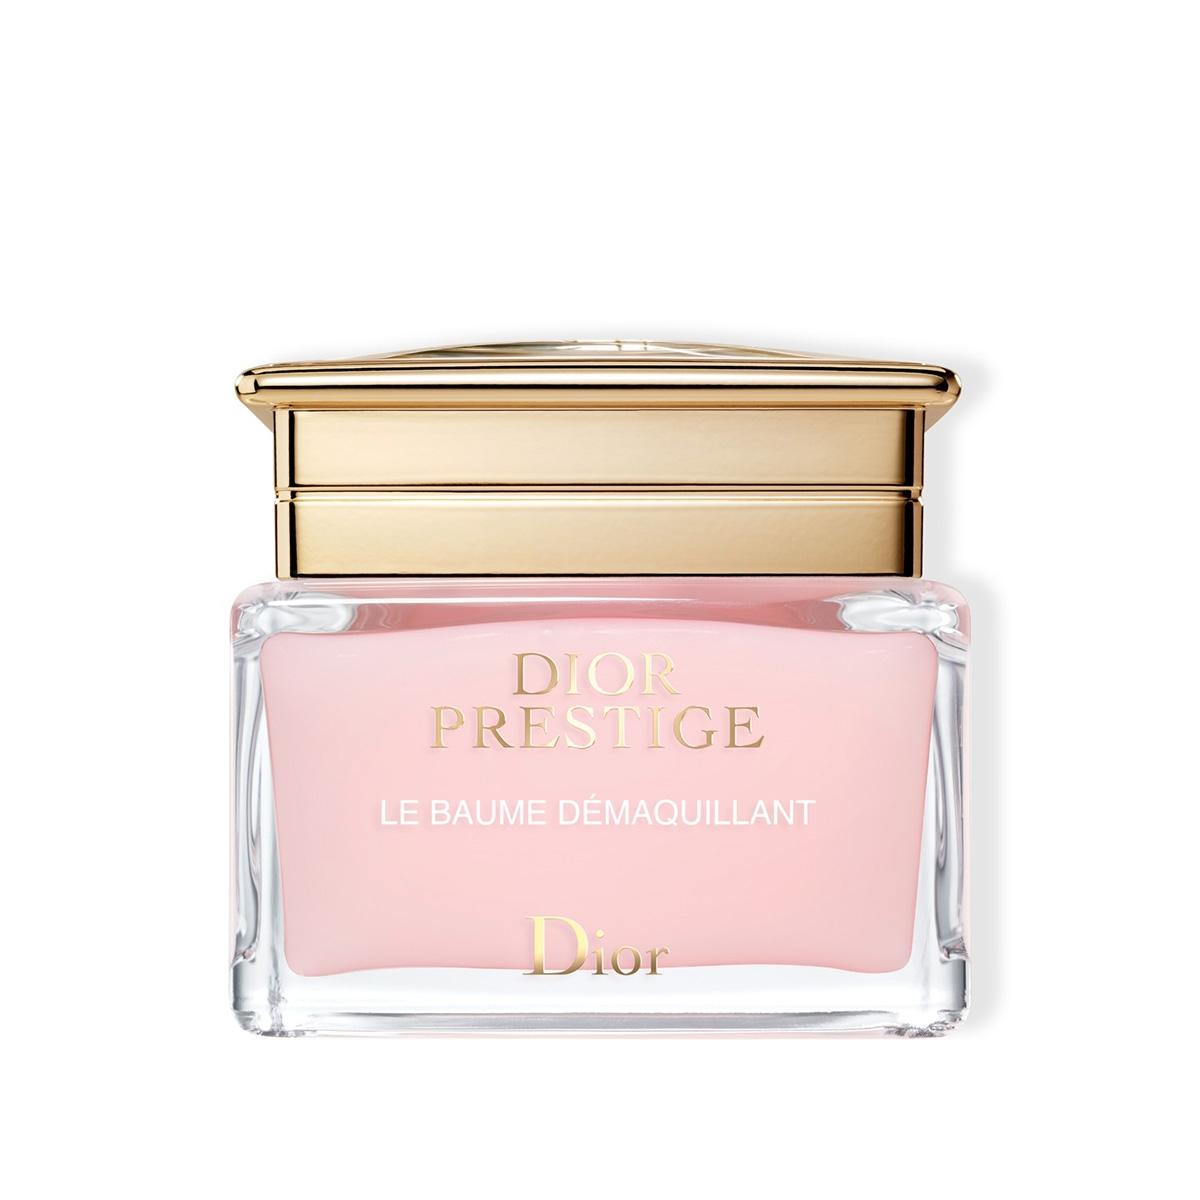 Christian Dior Dior Prestige Le Baume Démaquillant 150ml Τύπος Δέρματος : Όλοι οι τύποι